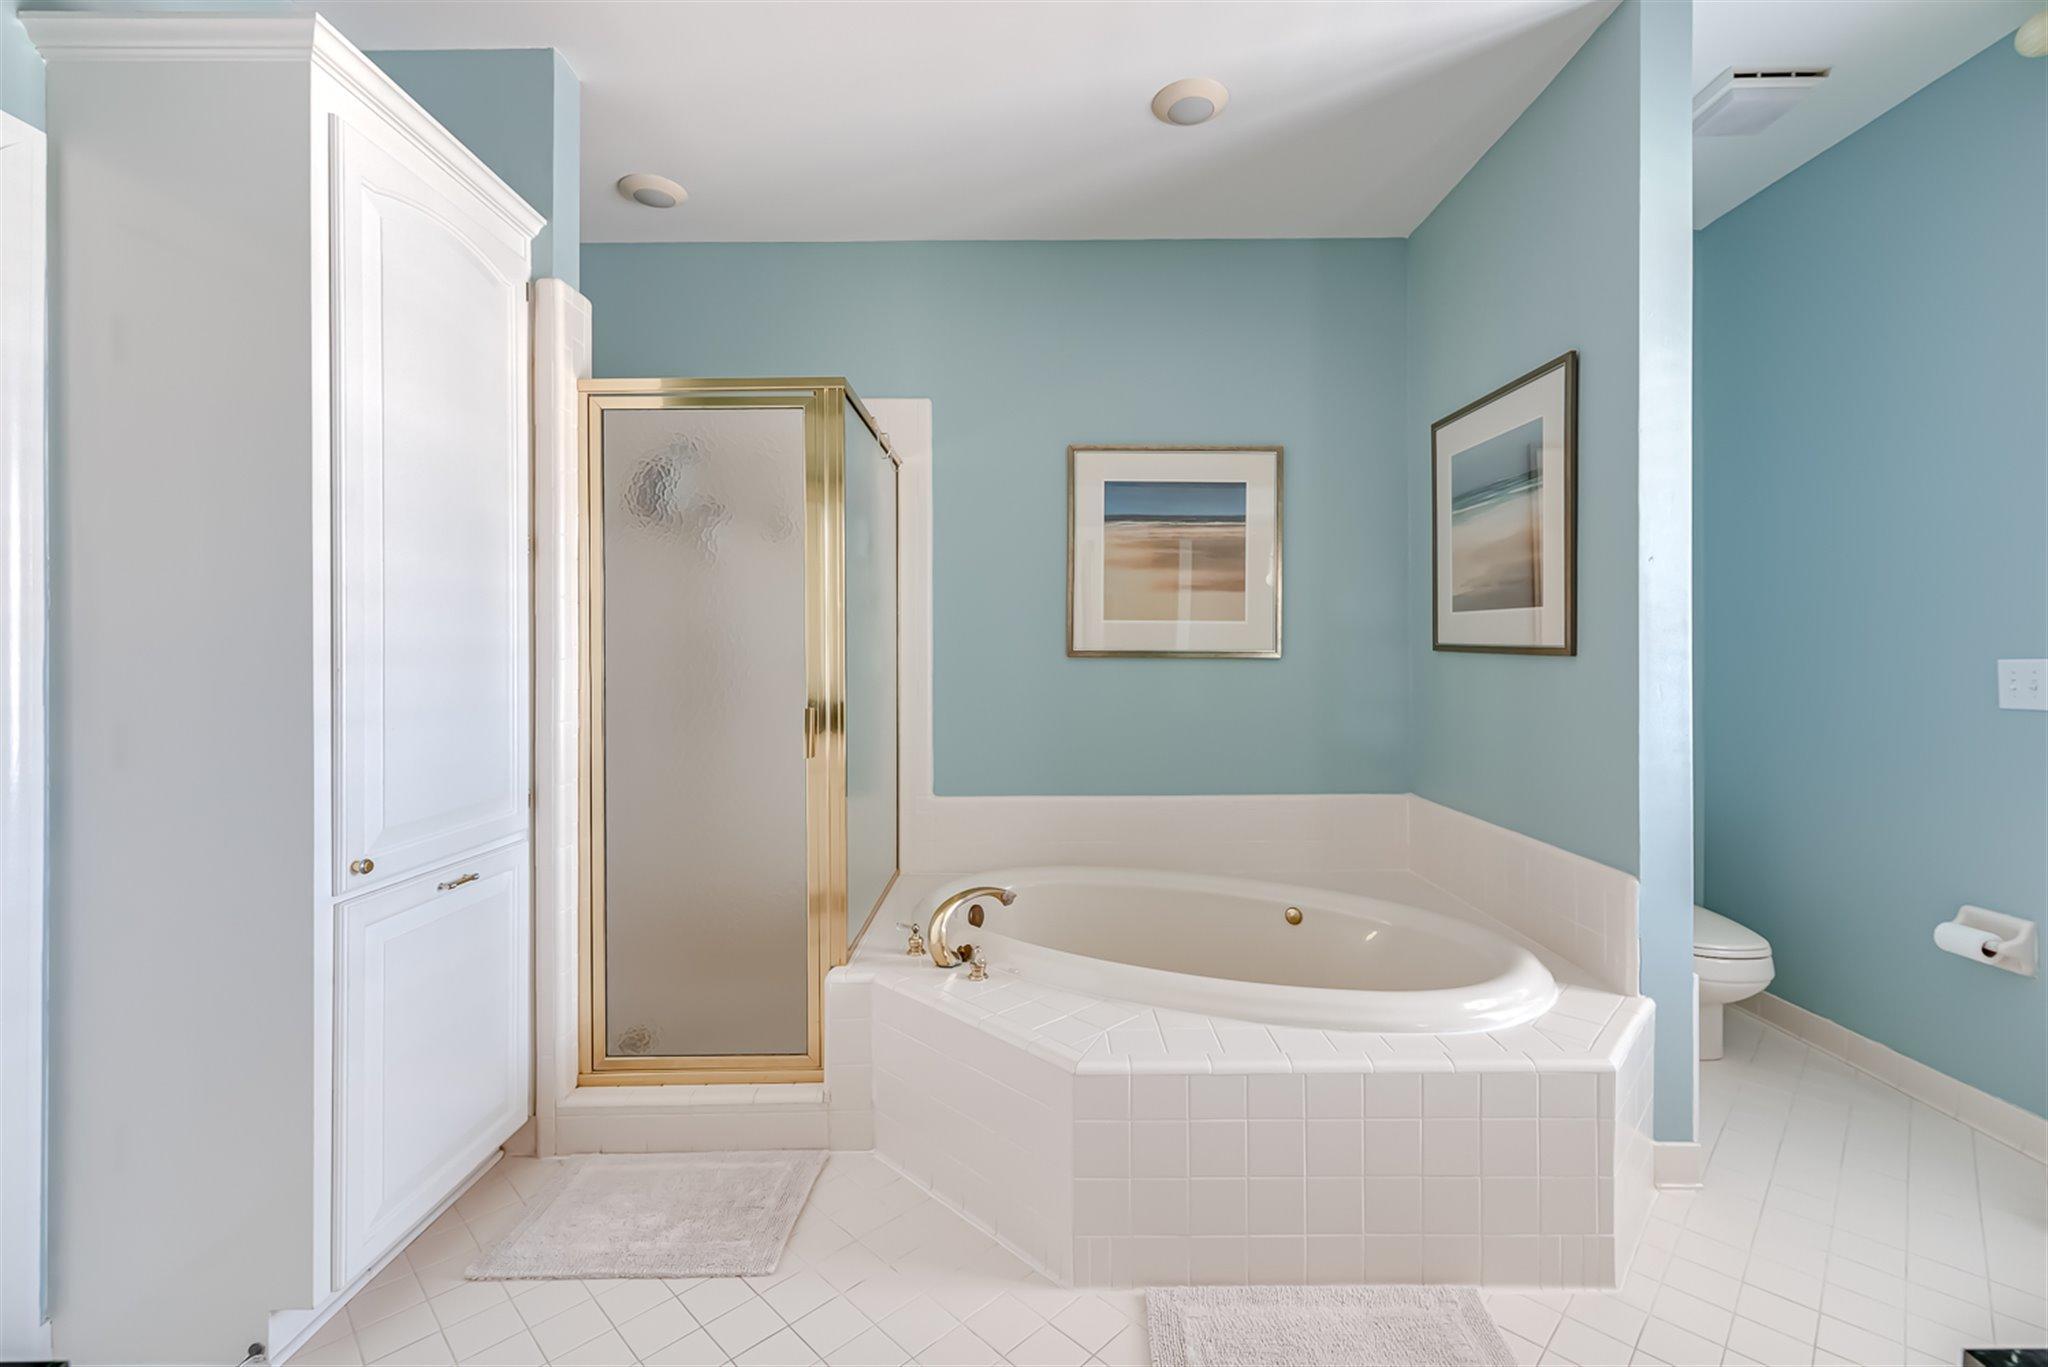 Indigo Point Homes For Sale - 50 Indigo Point, Charleston, SC - 30